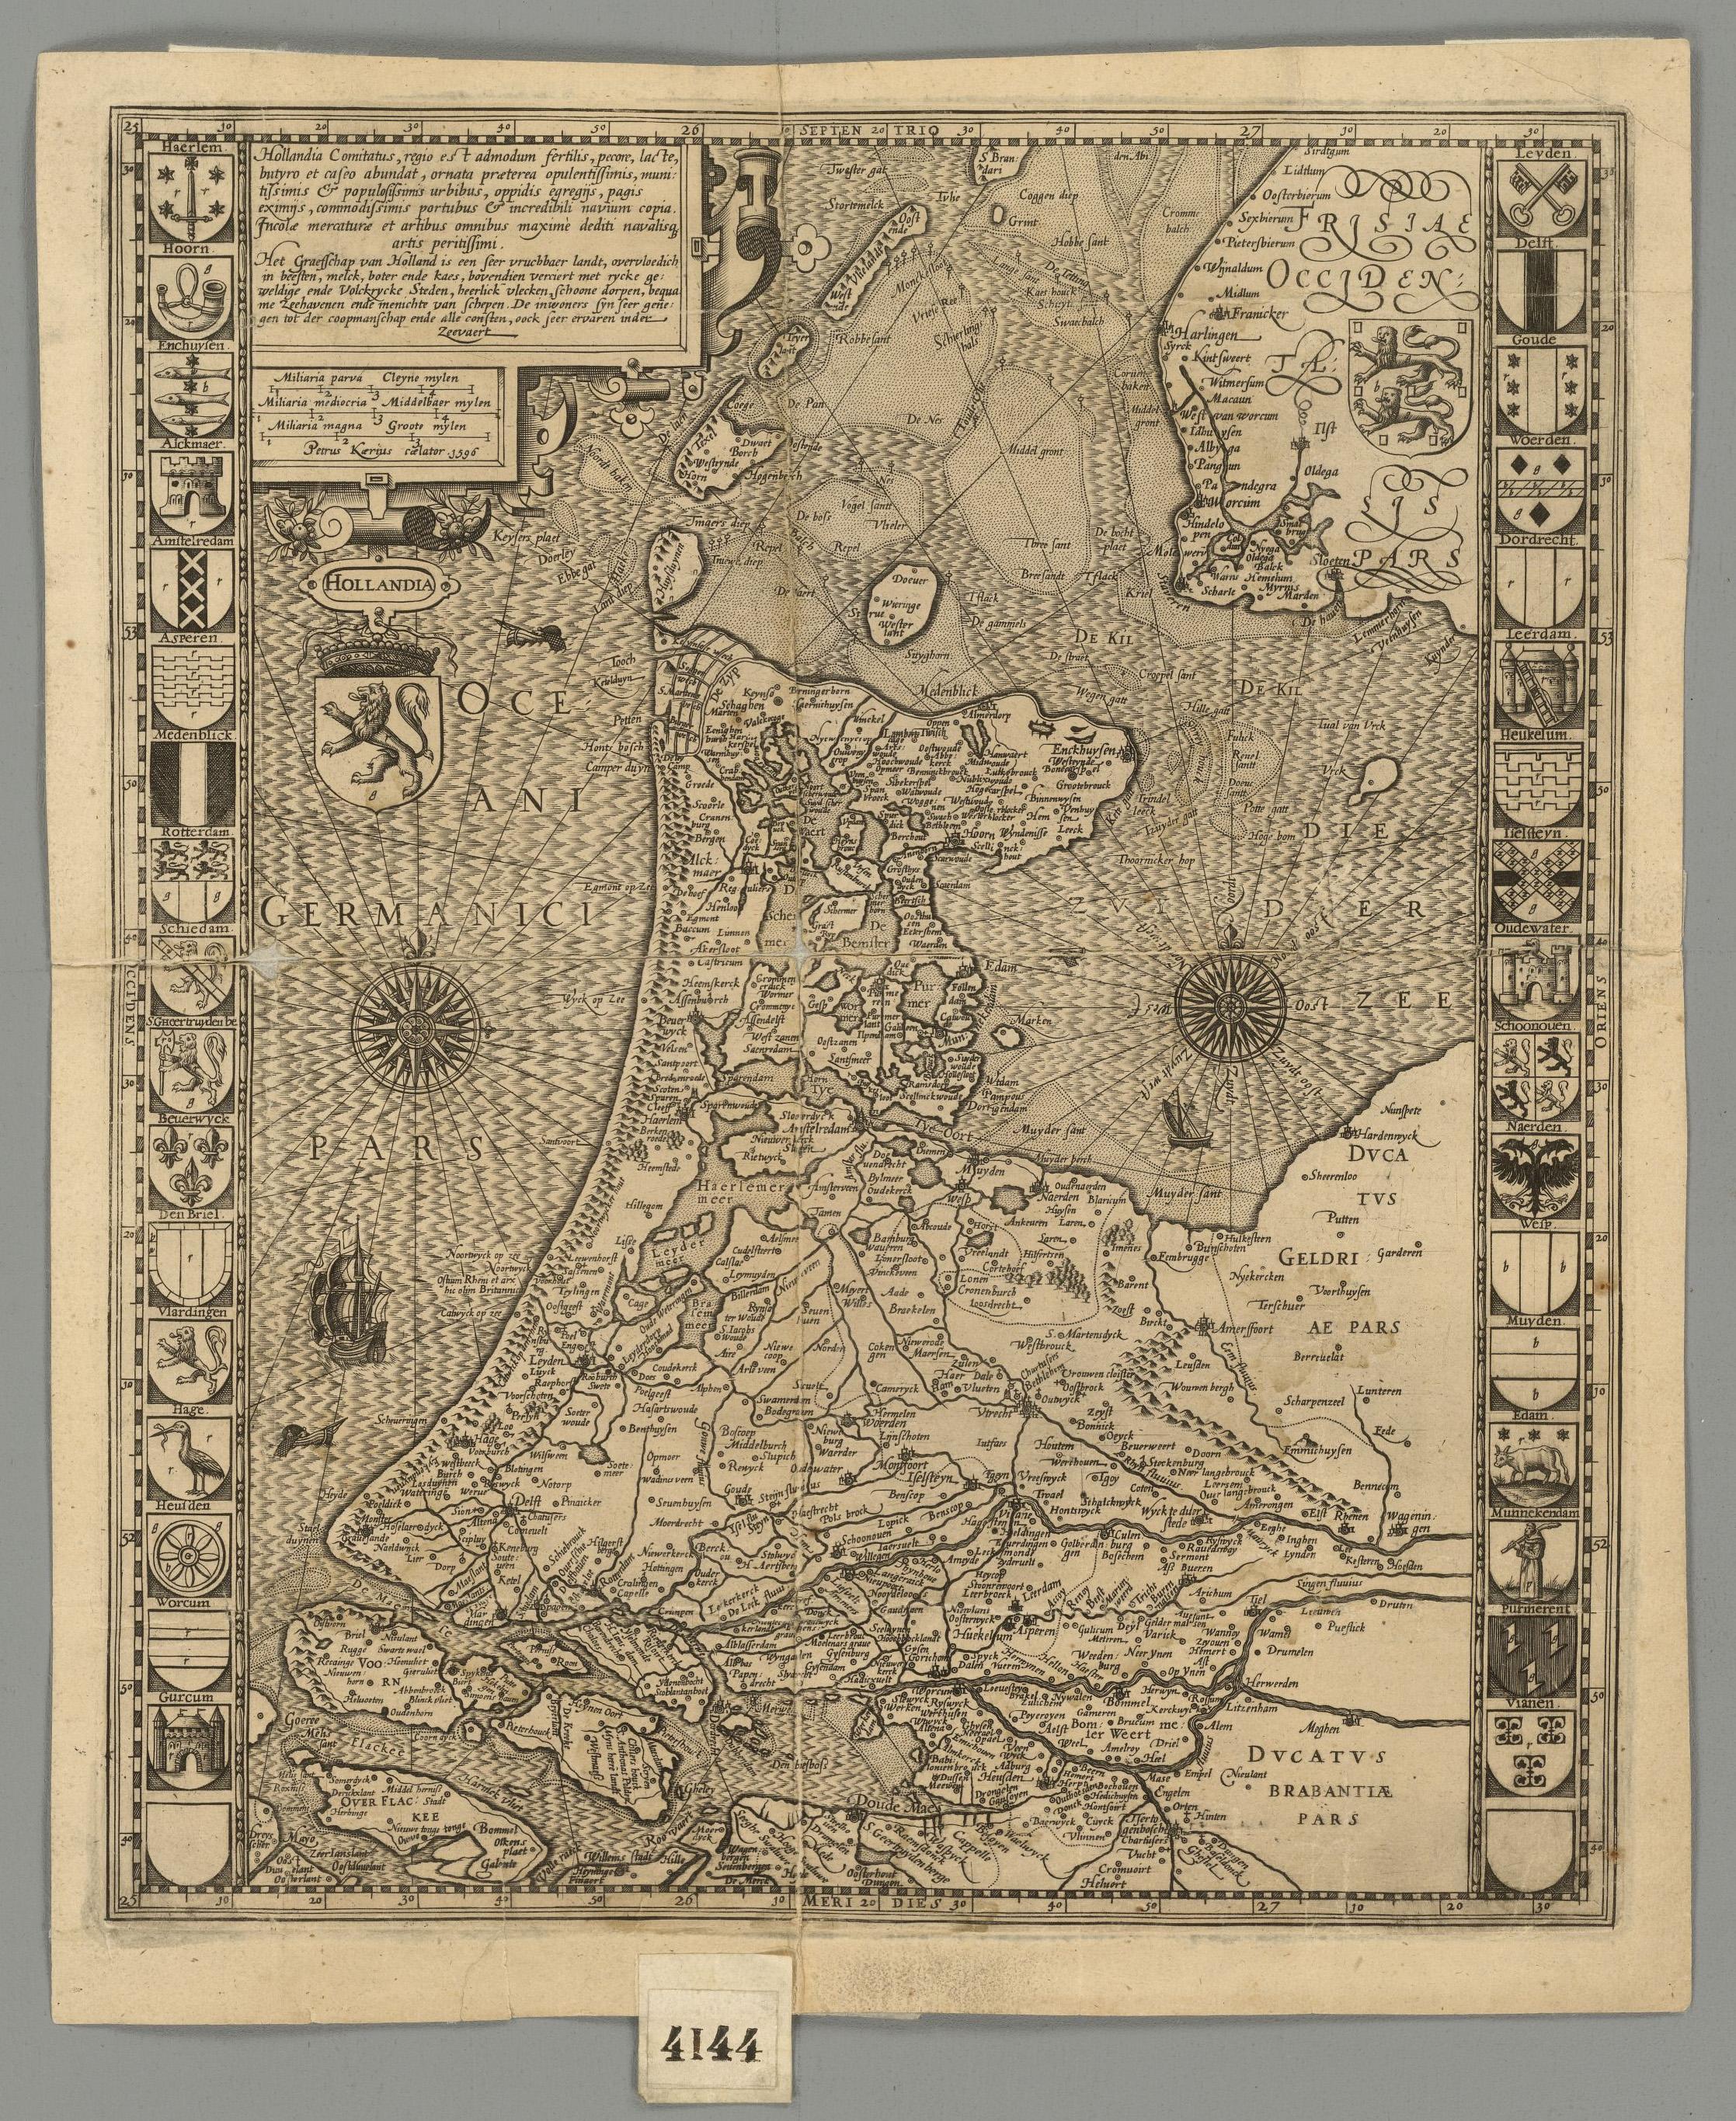 File:1596 Hollandia Comitatus Kaerius.jpg